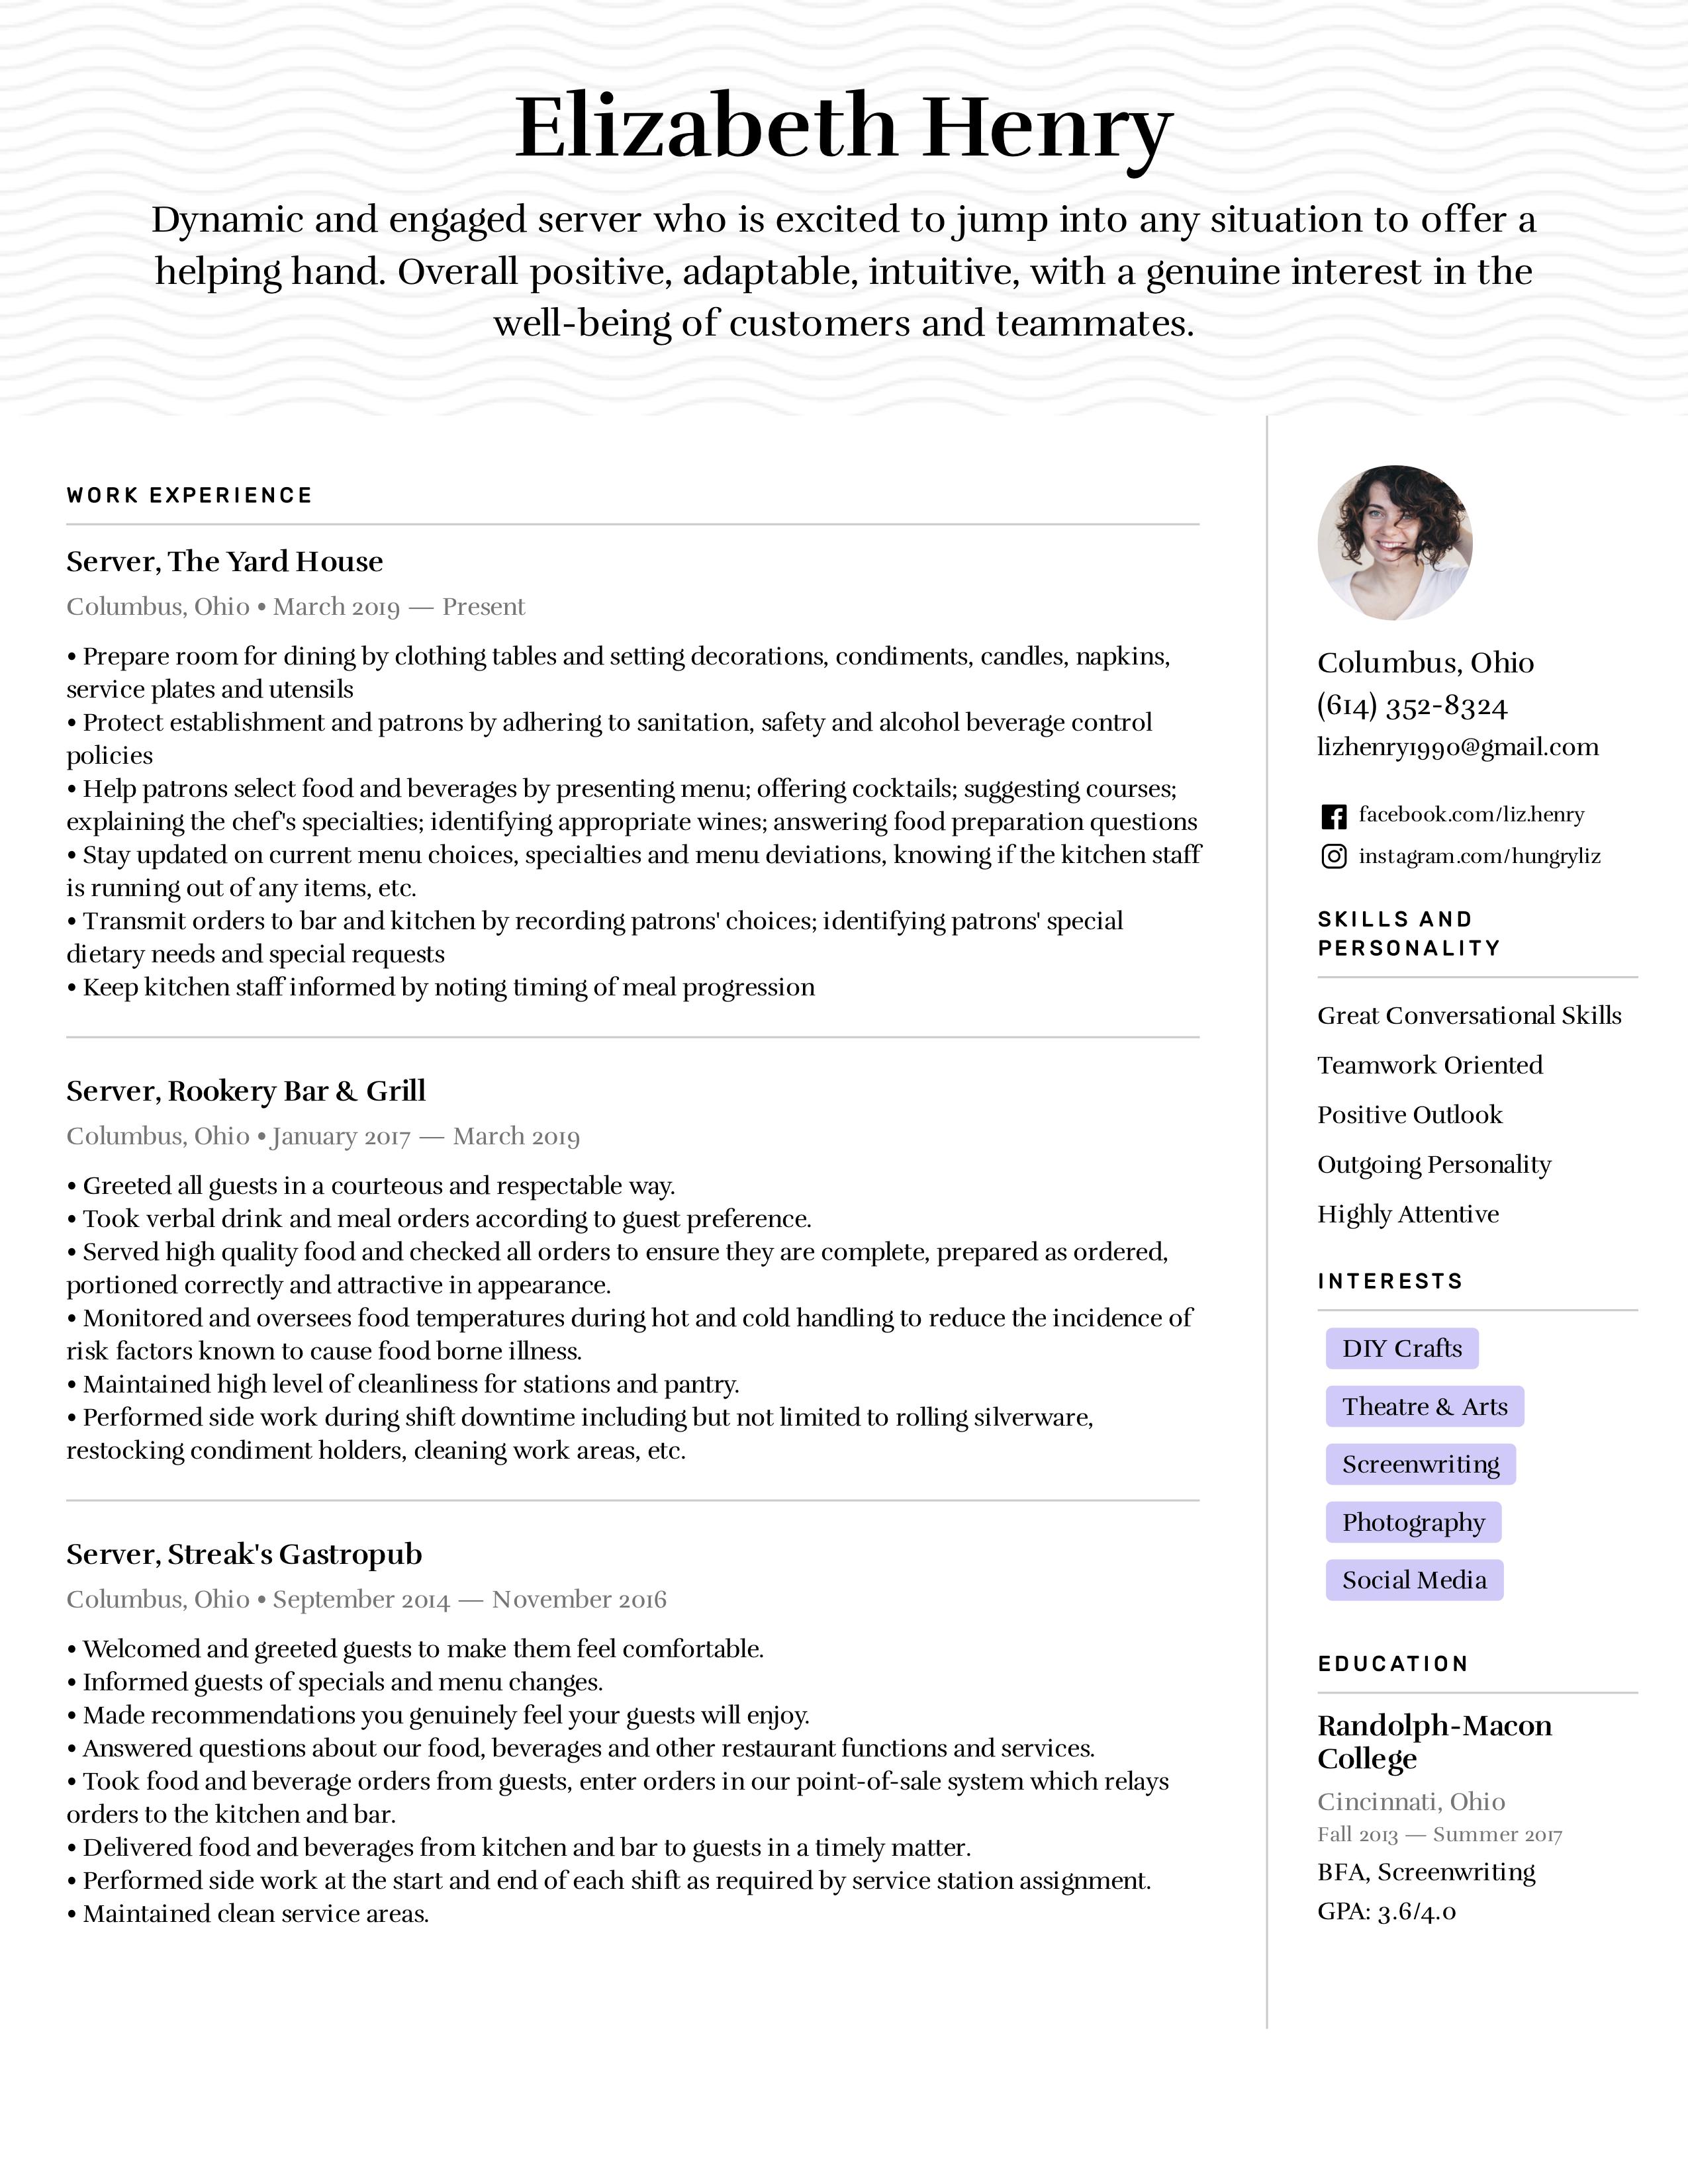 Server Resume Example & Writing Tips | Easy Resume